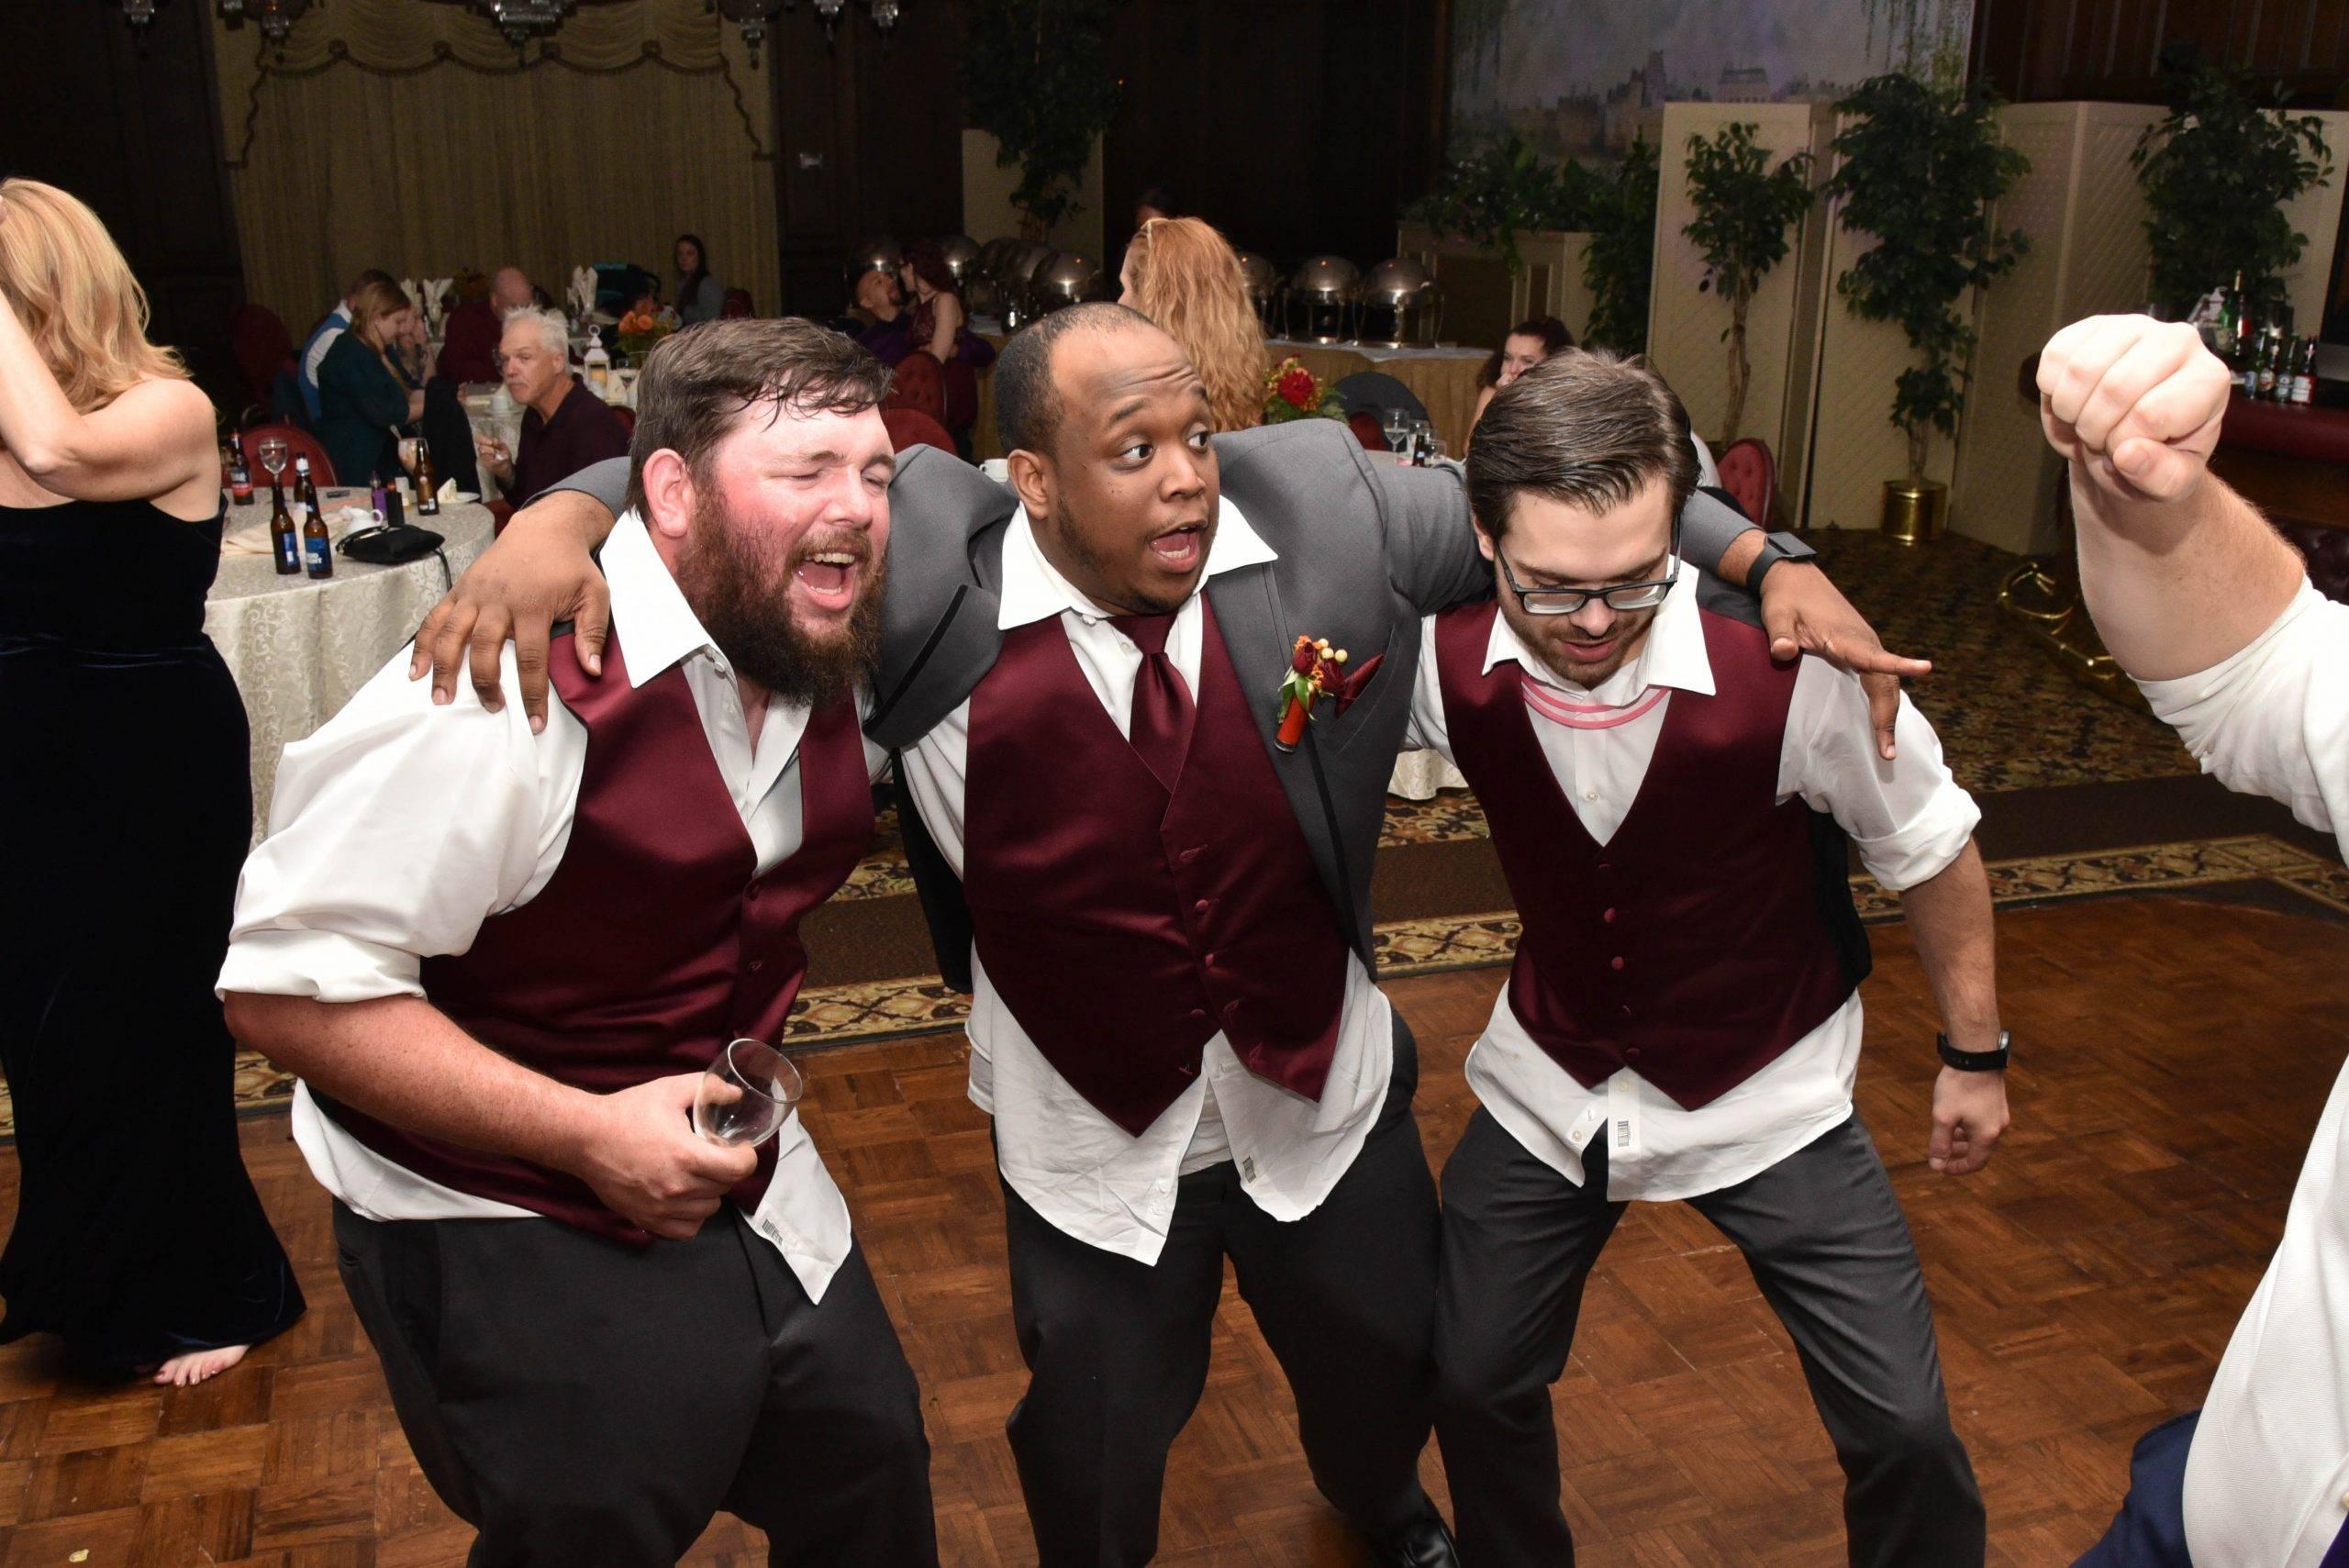 Birchwood Manor dancing groomsmen